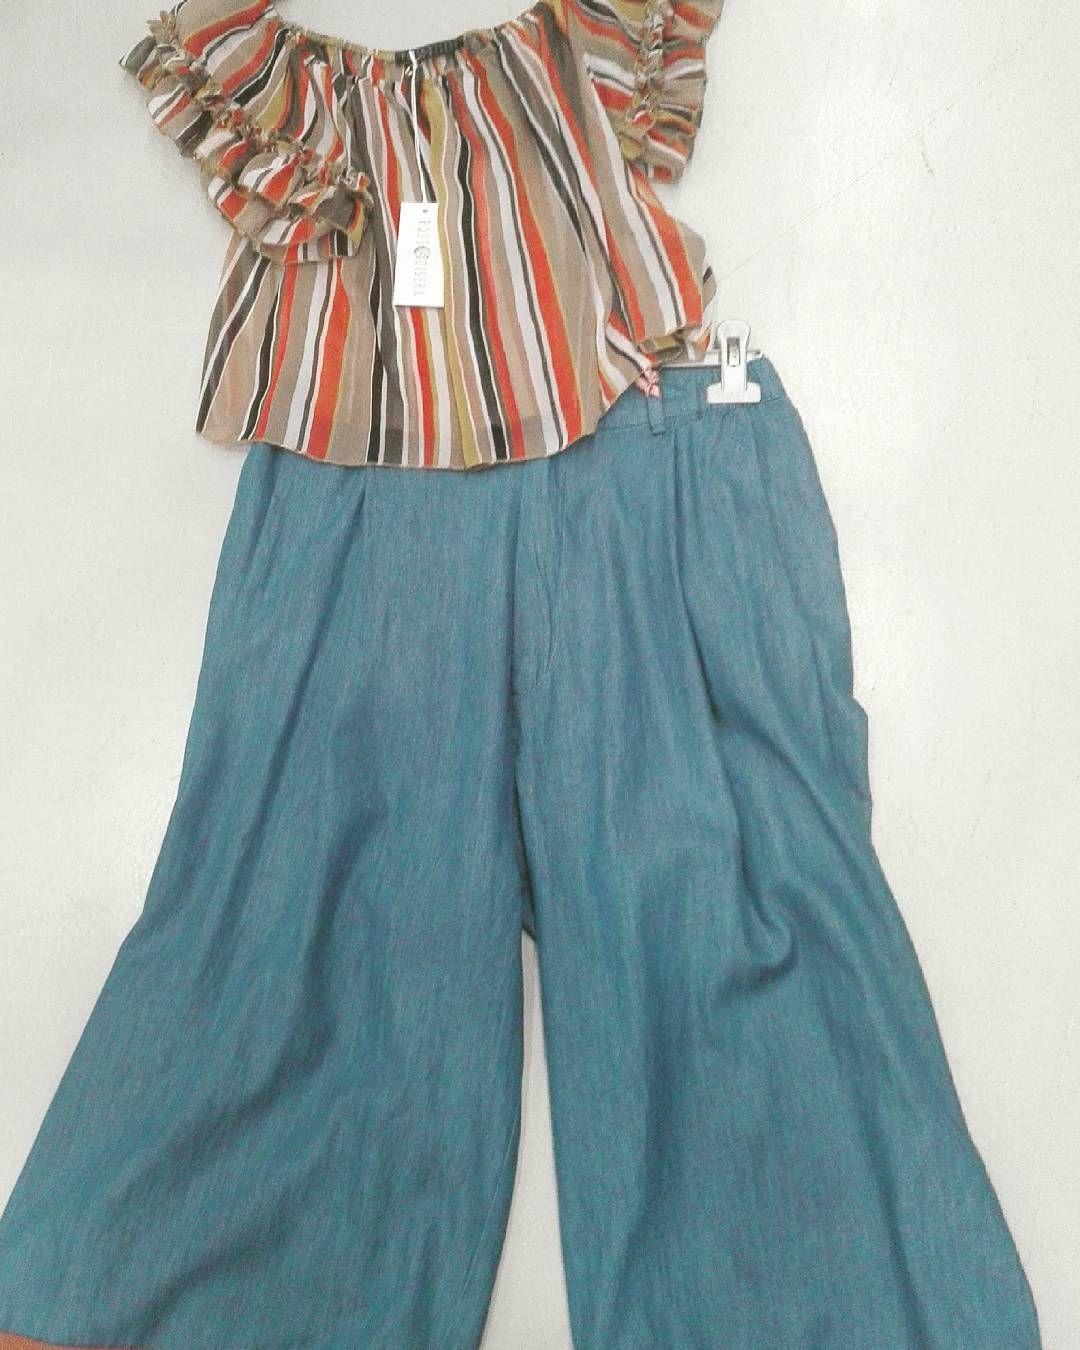 #newcollection #newlook #fashion #madeinitaly #glamour #womensfashionblogger #womensfashion by rossodiserafashion